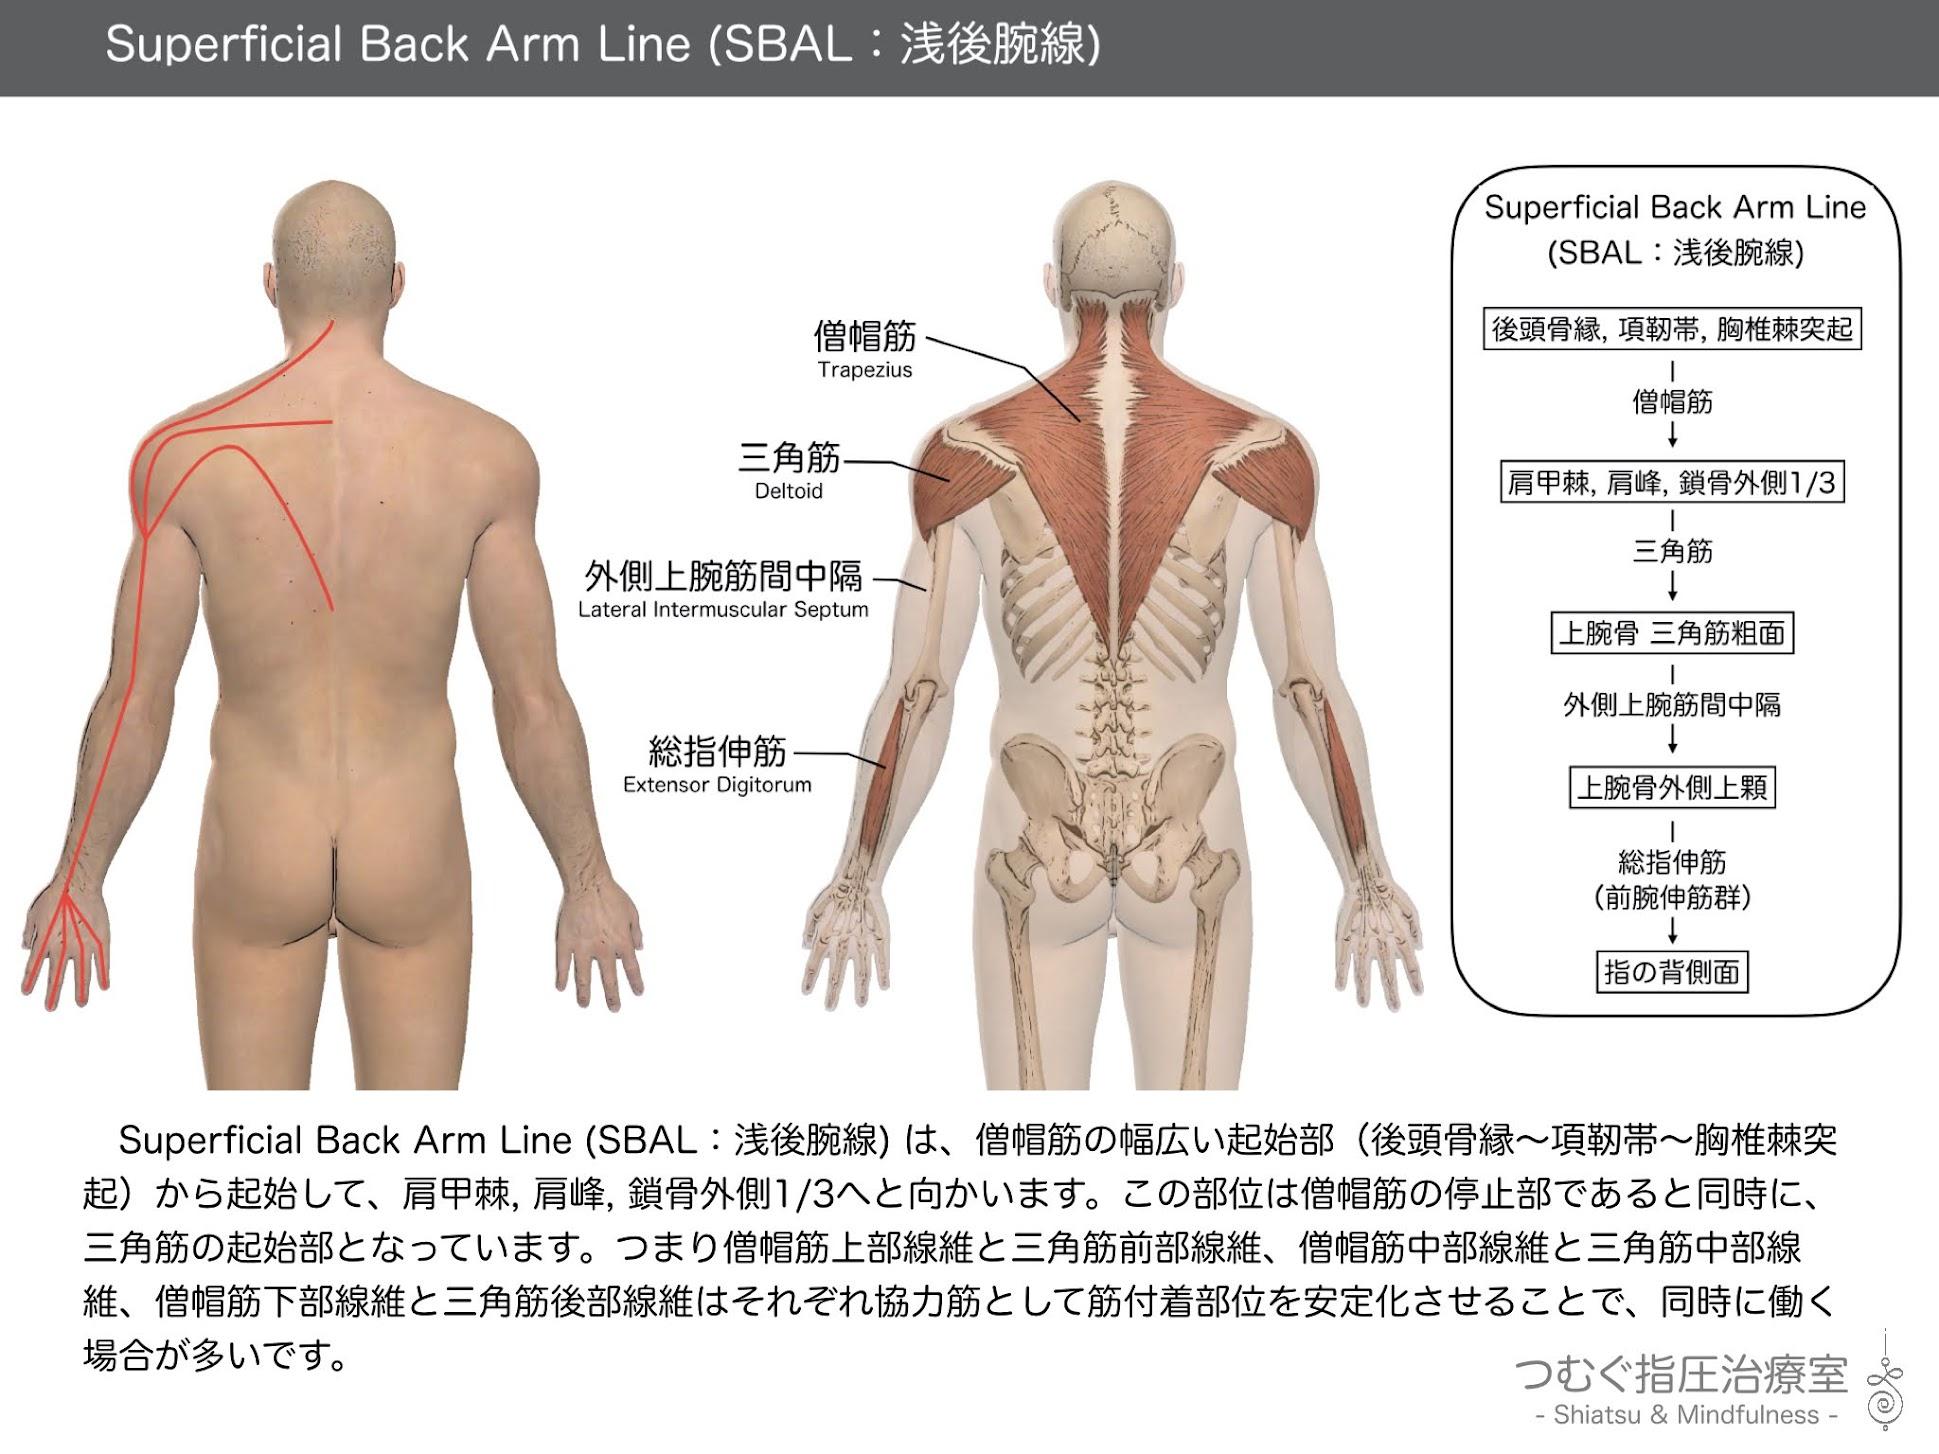 Superficial Back Arm Line (SBAL:浅後腕線)